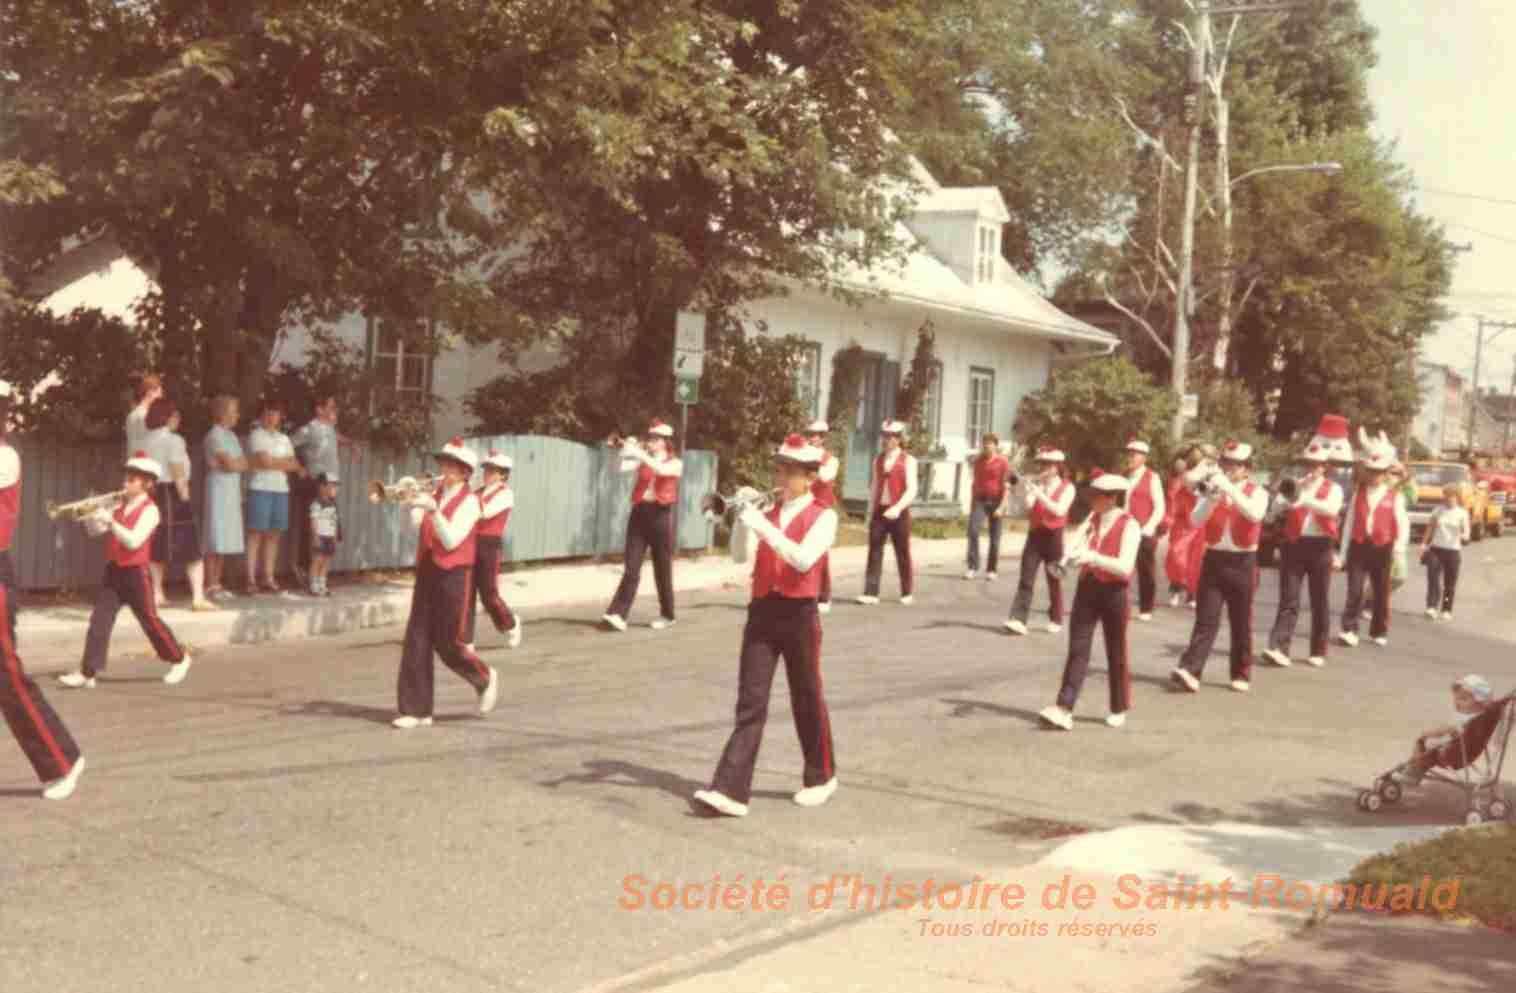 1984. St-Romuald